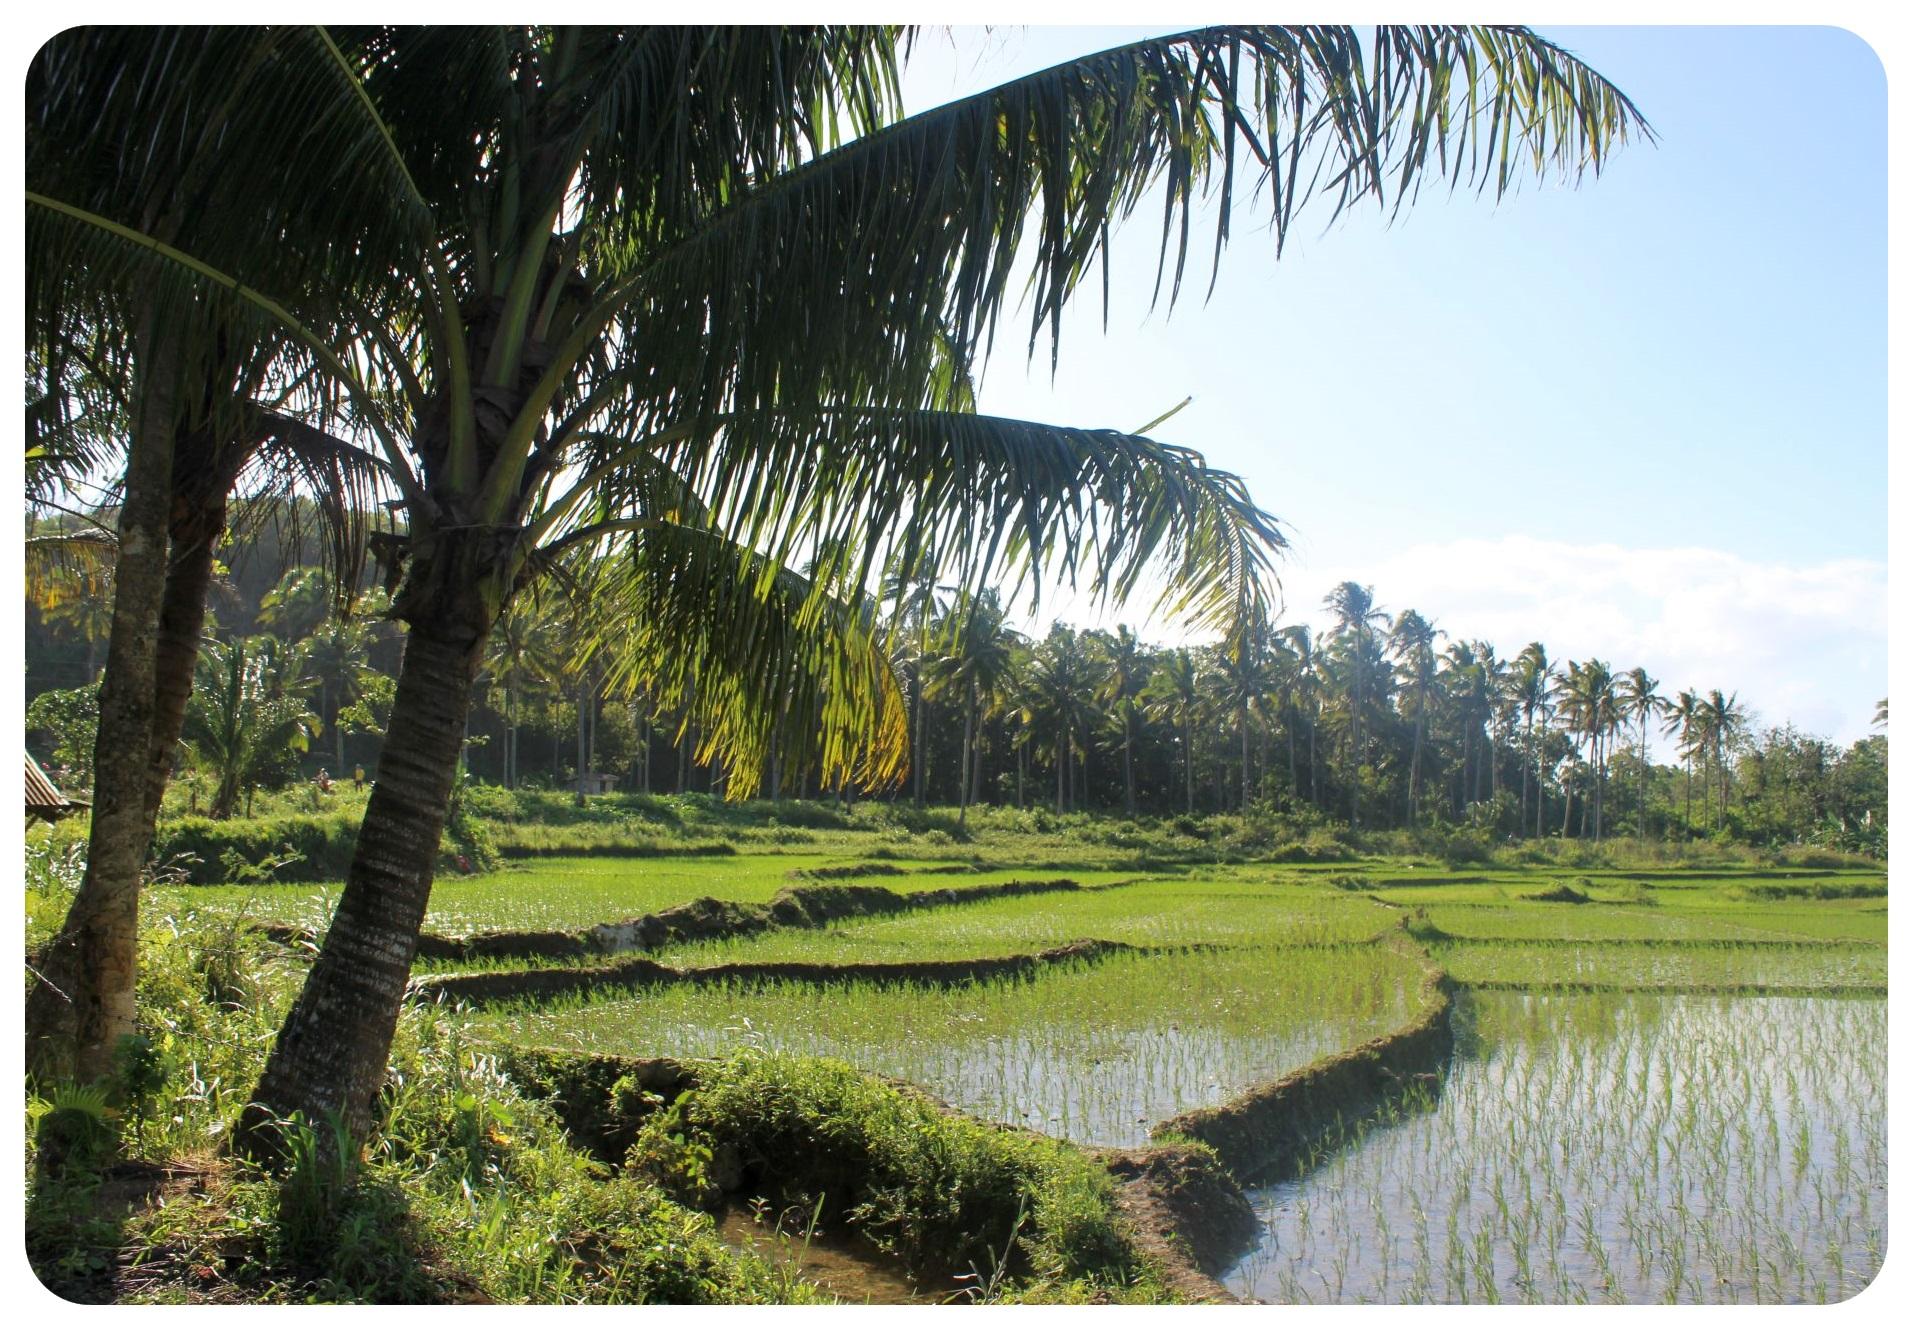 bohol rice fields philippines1